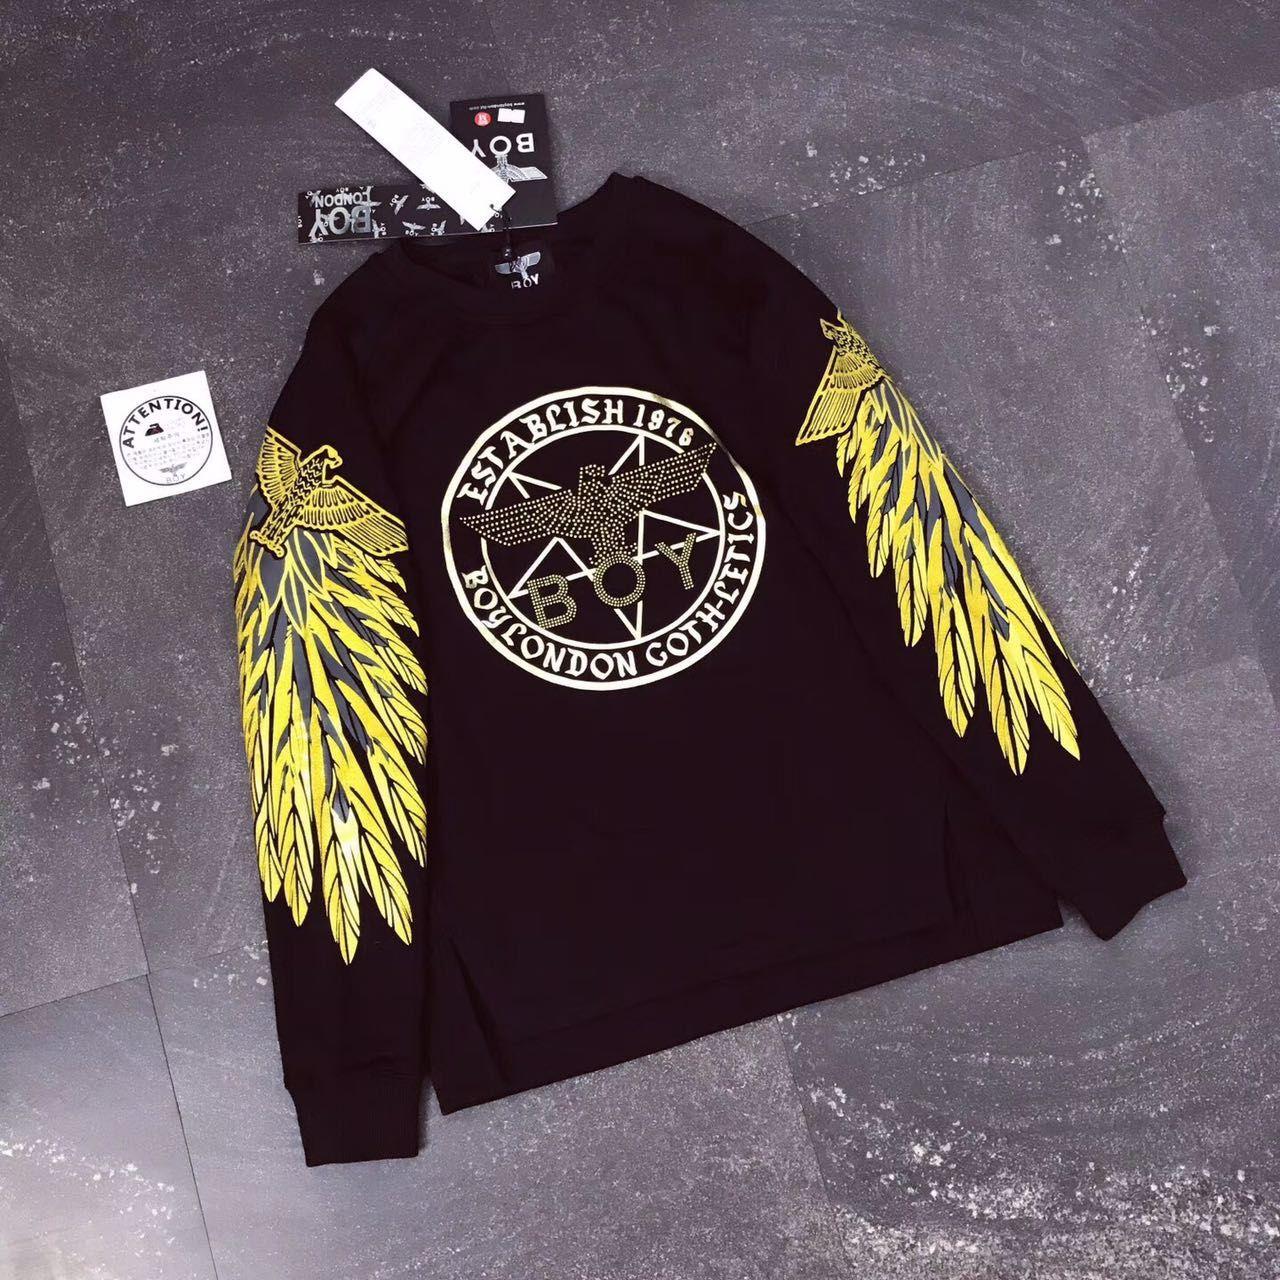 Boy London Oversize Sweatshirt With Gold Embroidery Pf4452 Giyim [ 1280 x 1280 Pixel ]